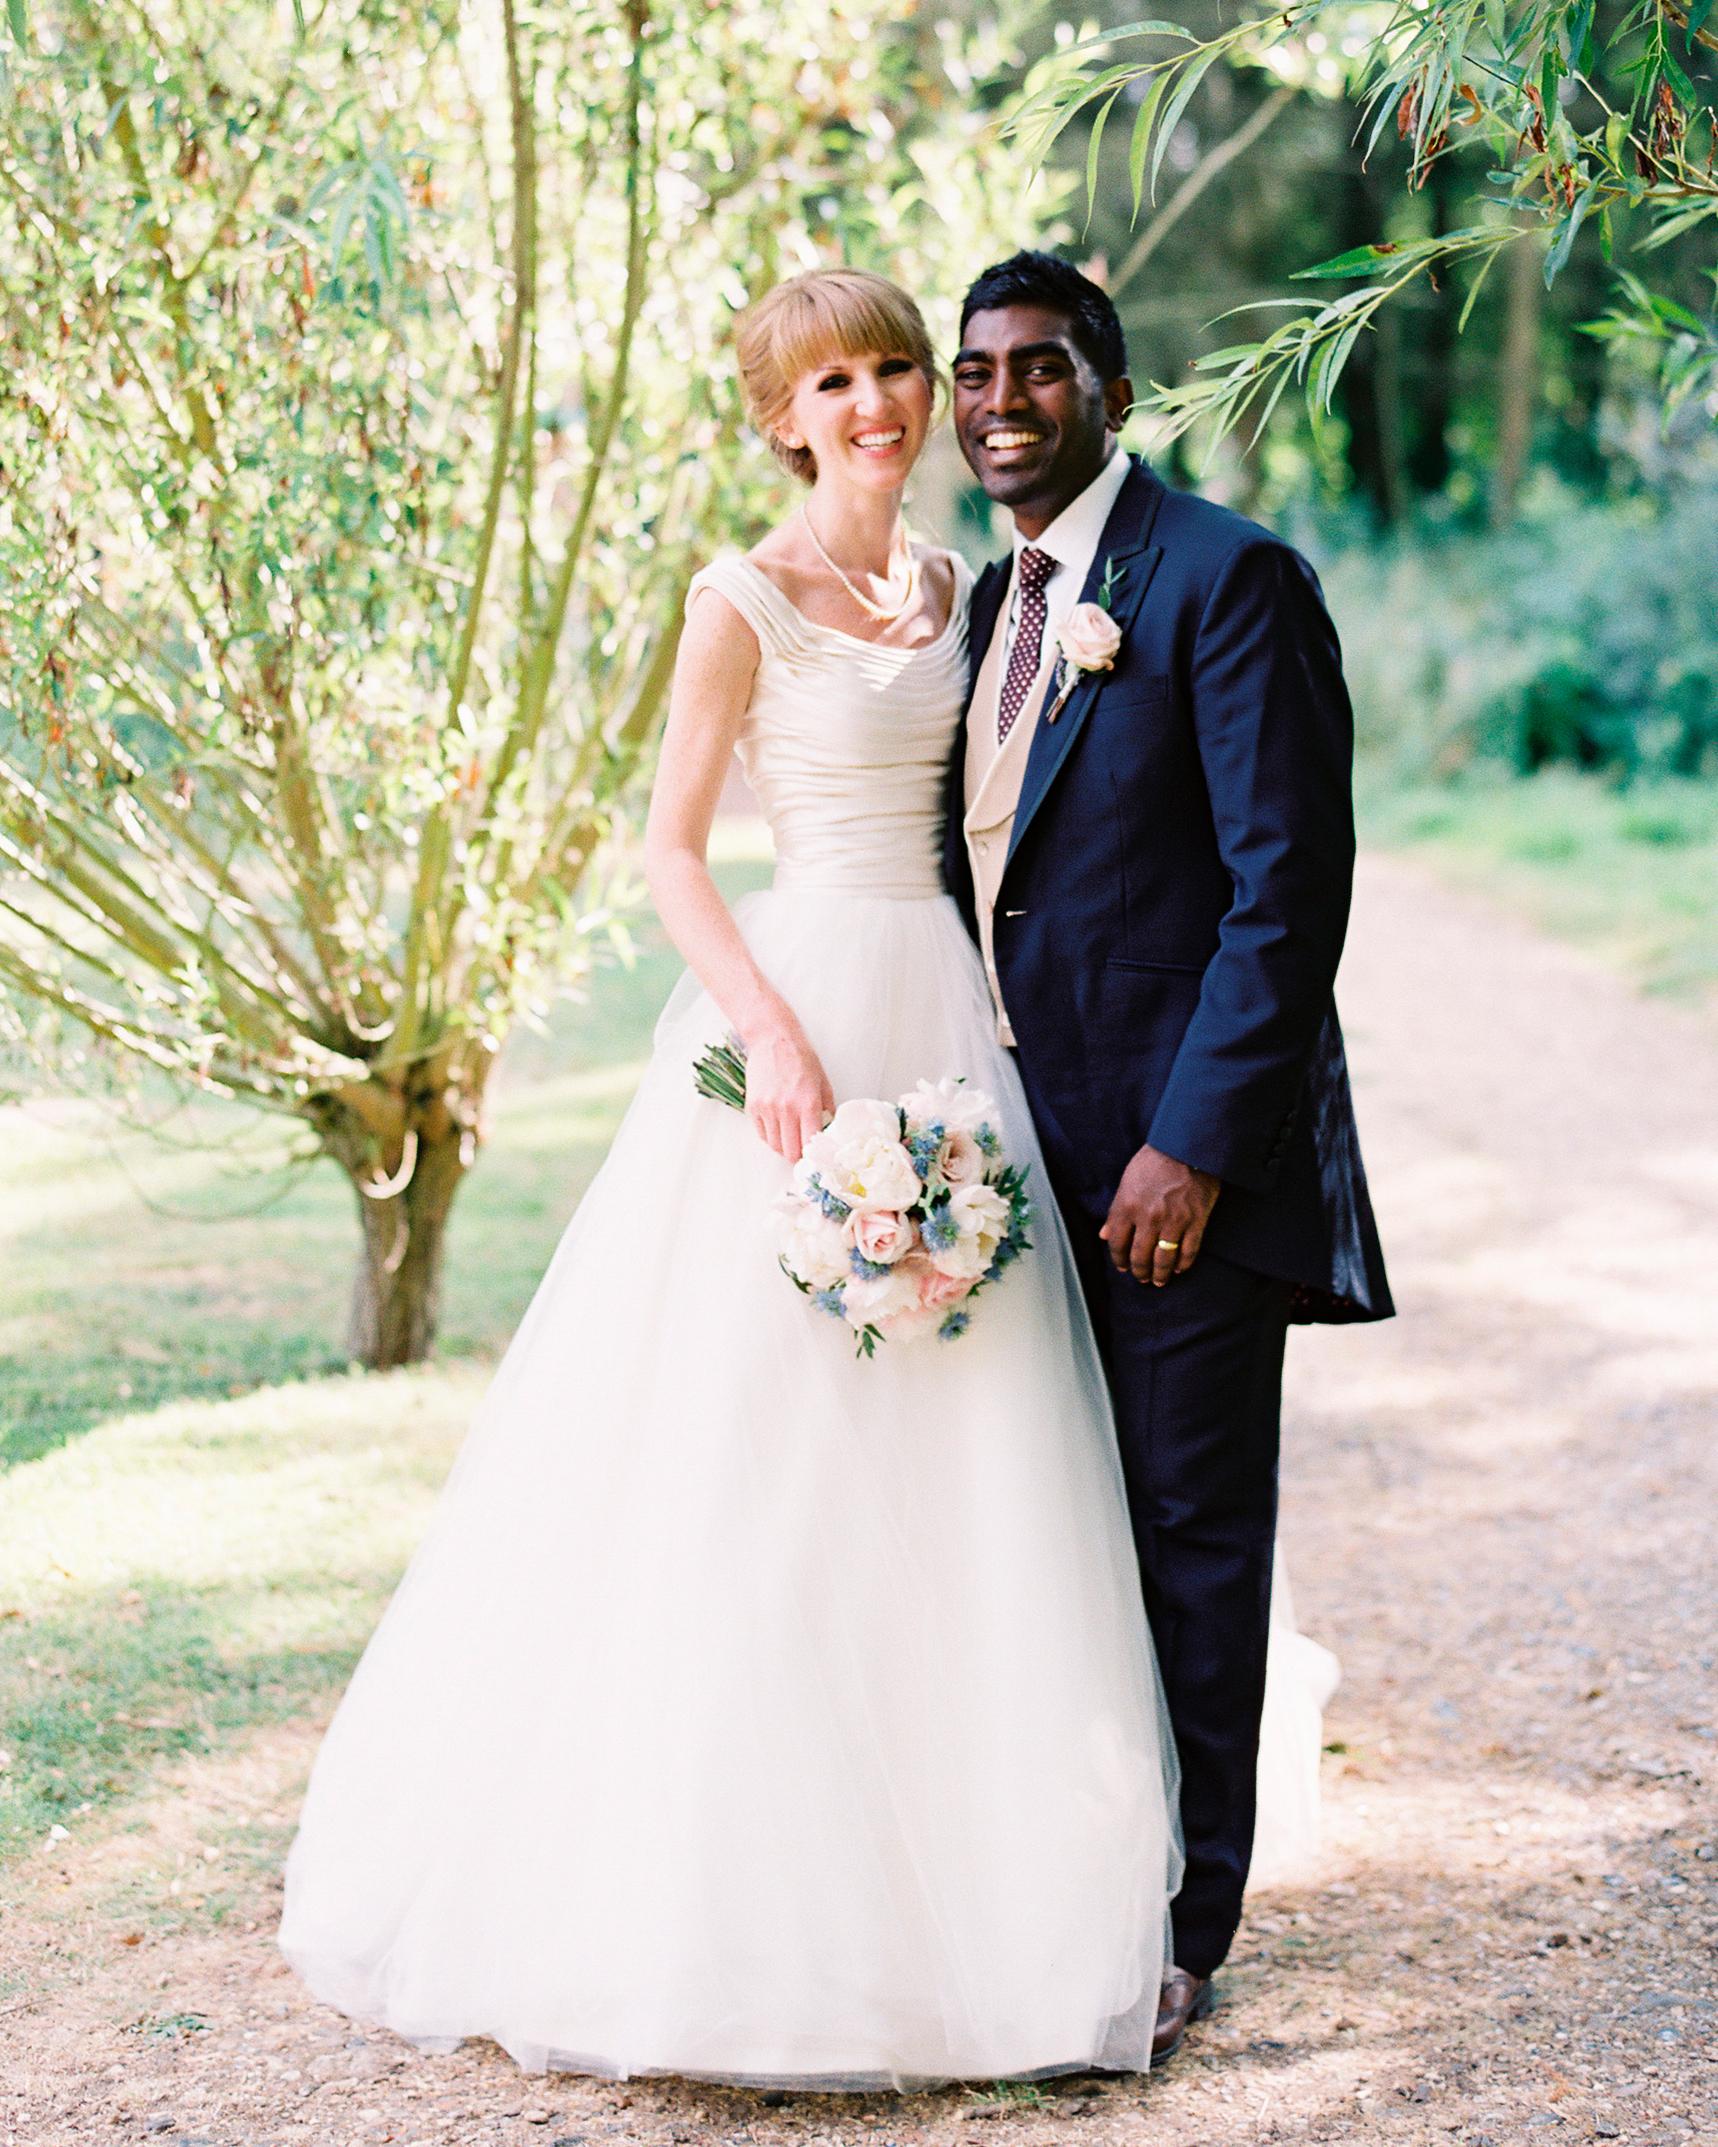 hayley-andrew-wedding-portrait2-0714.jpg